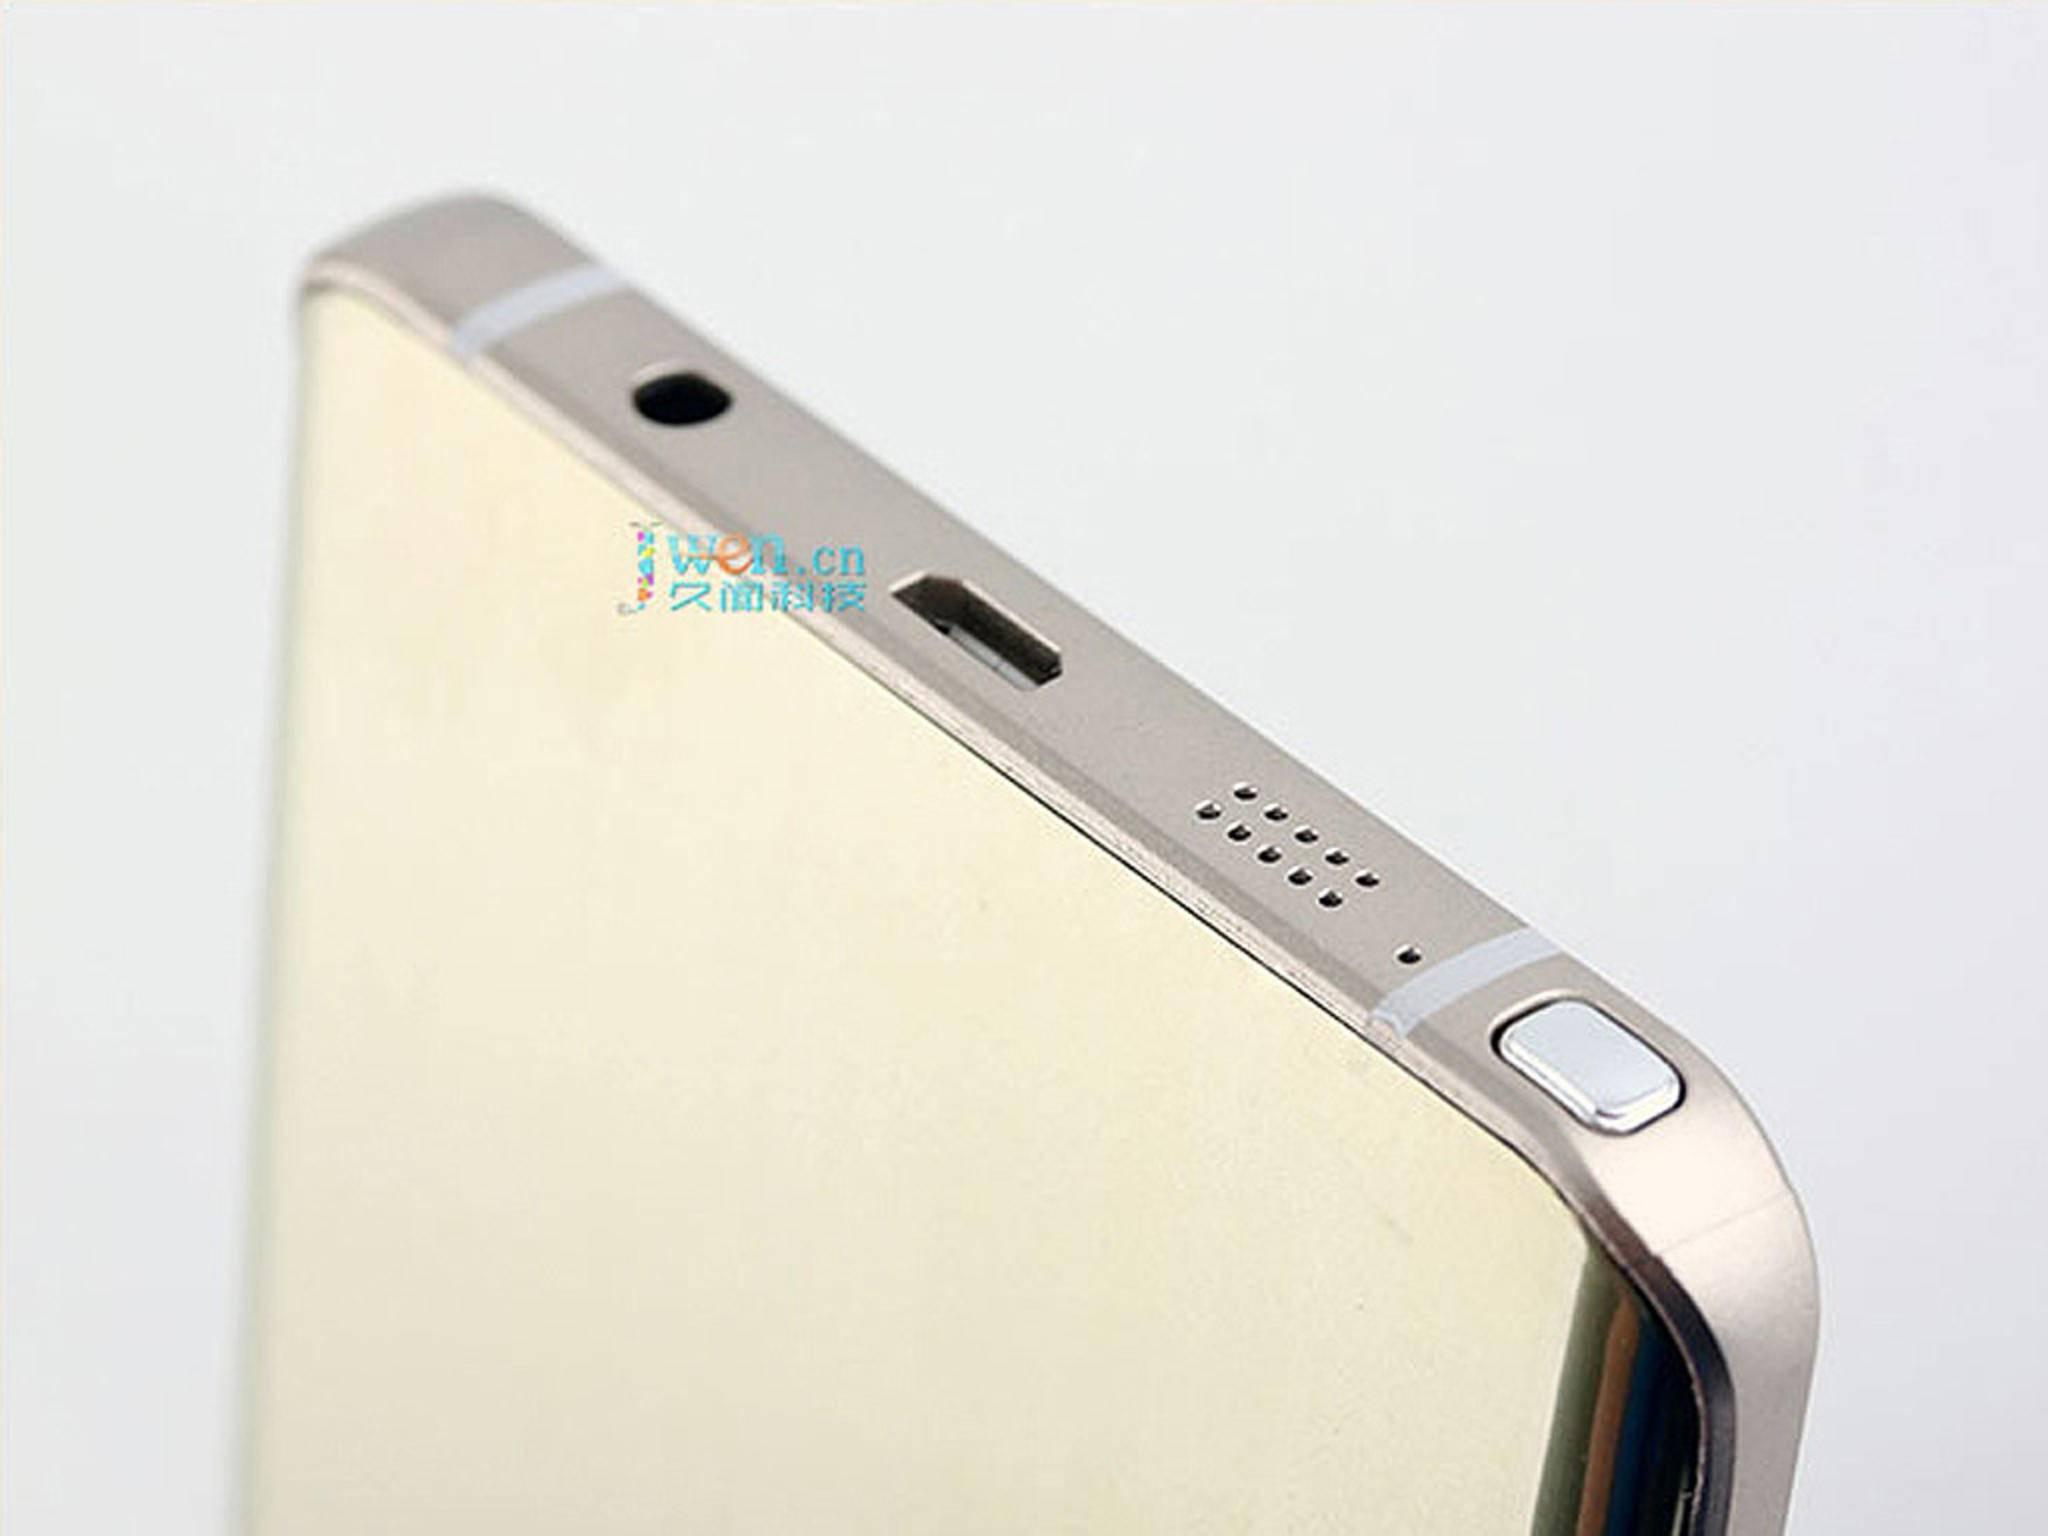 Galaxy Note 5